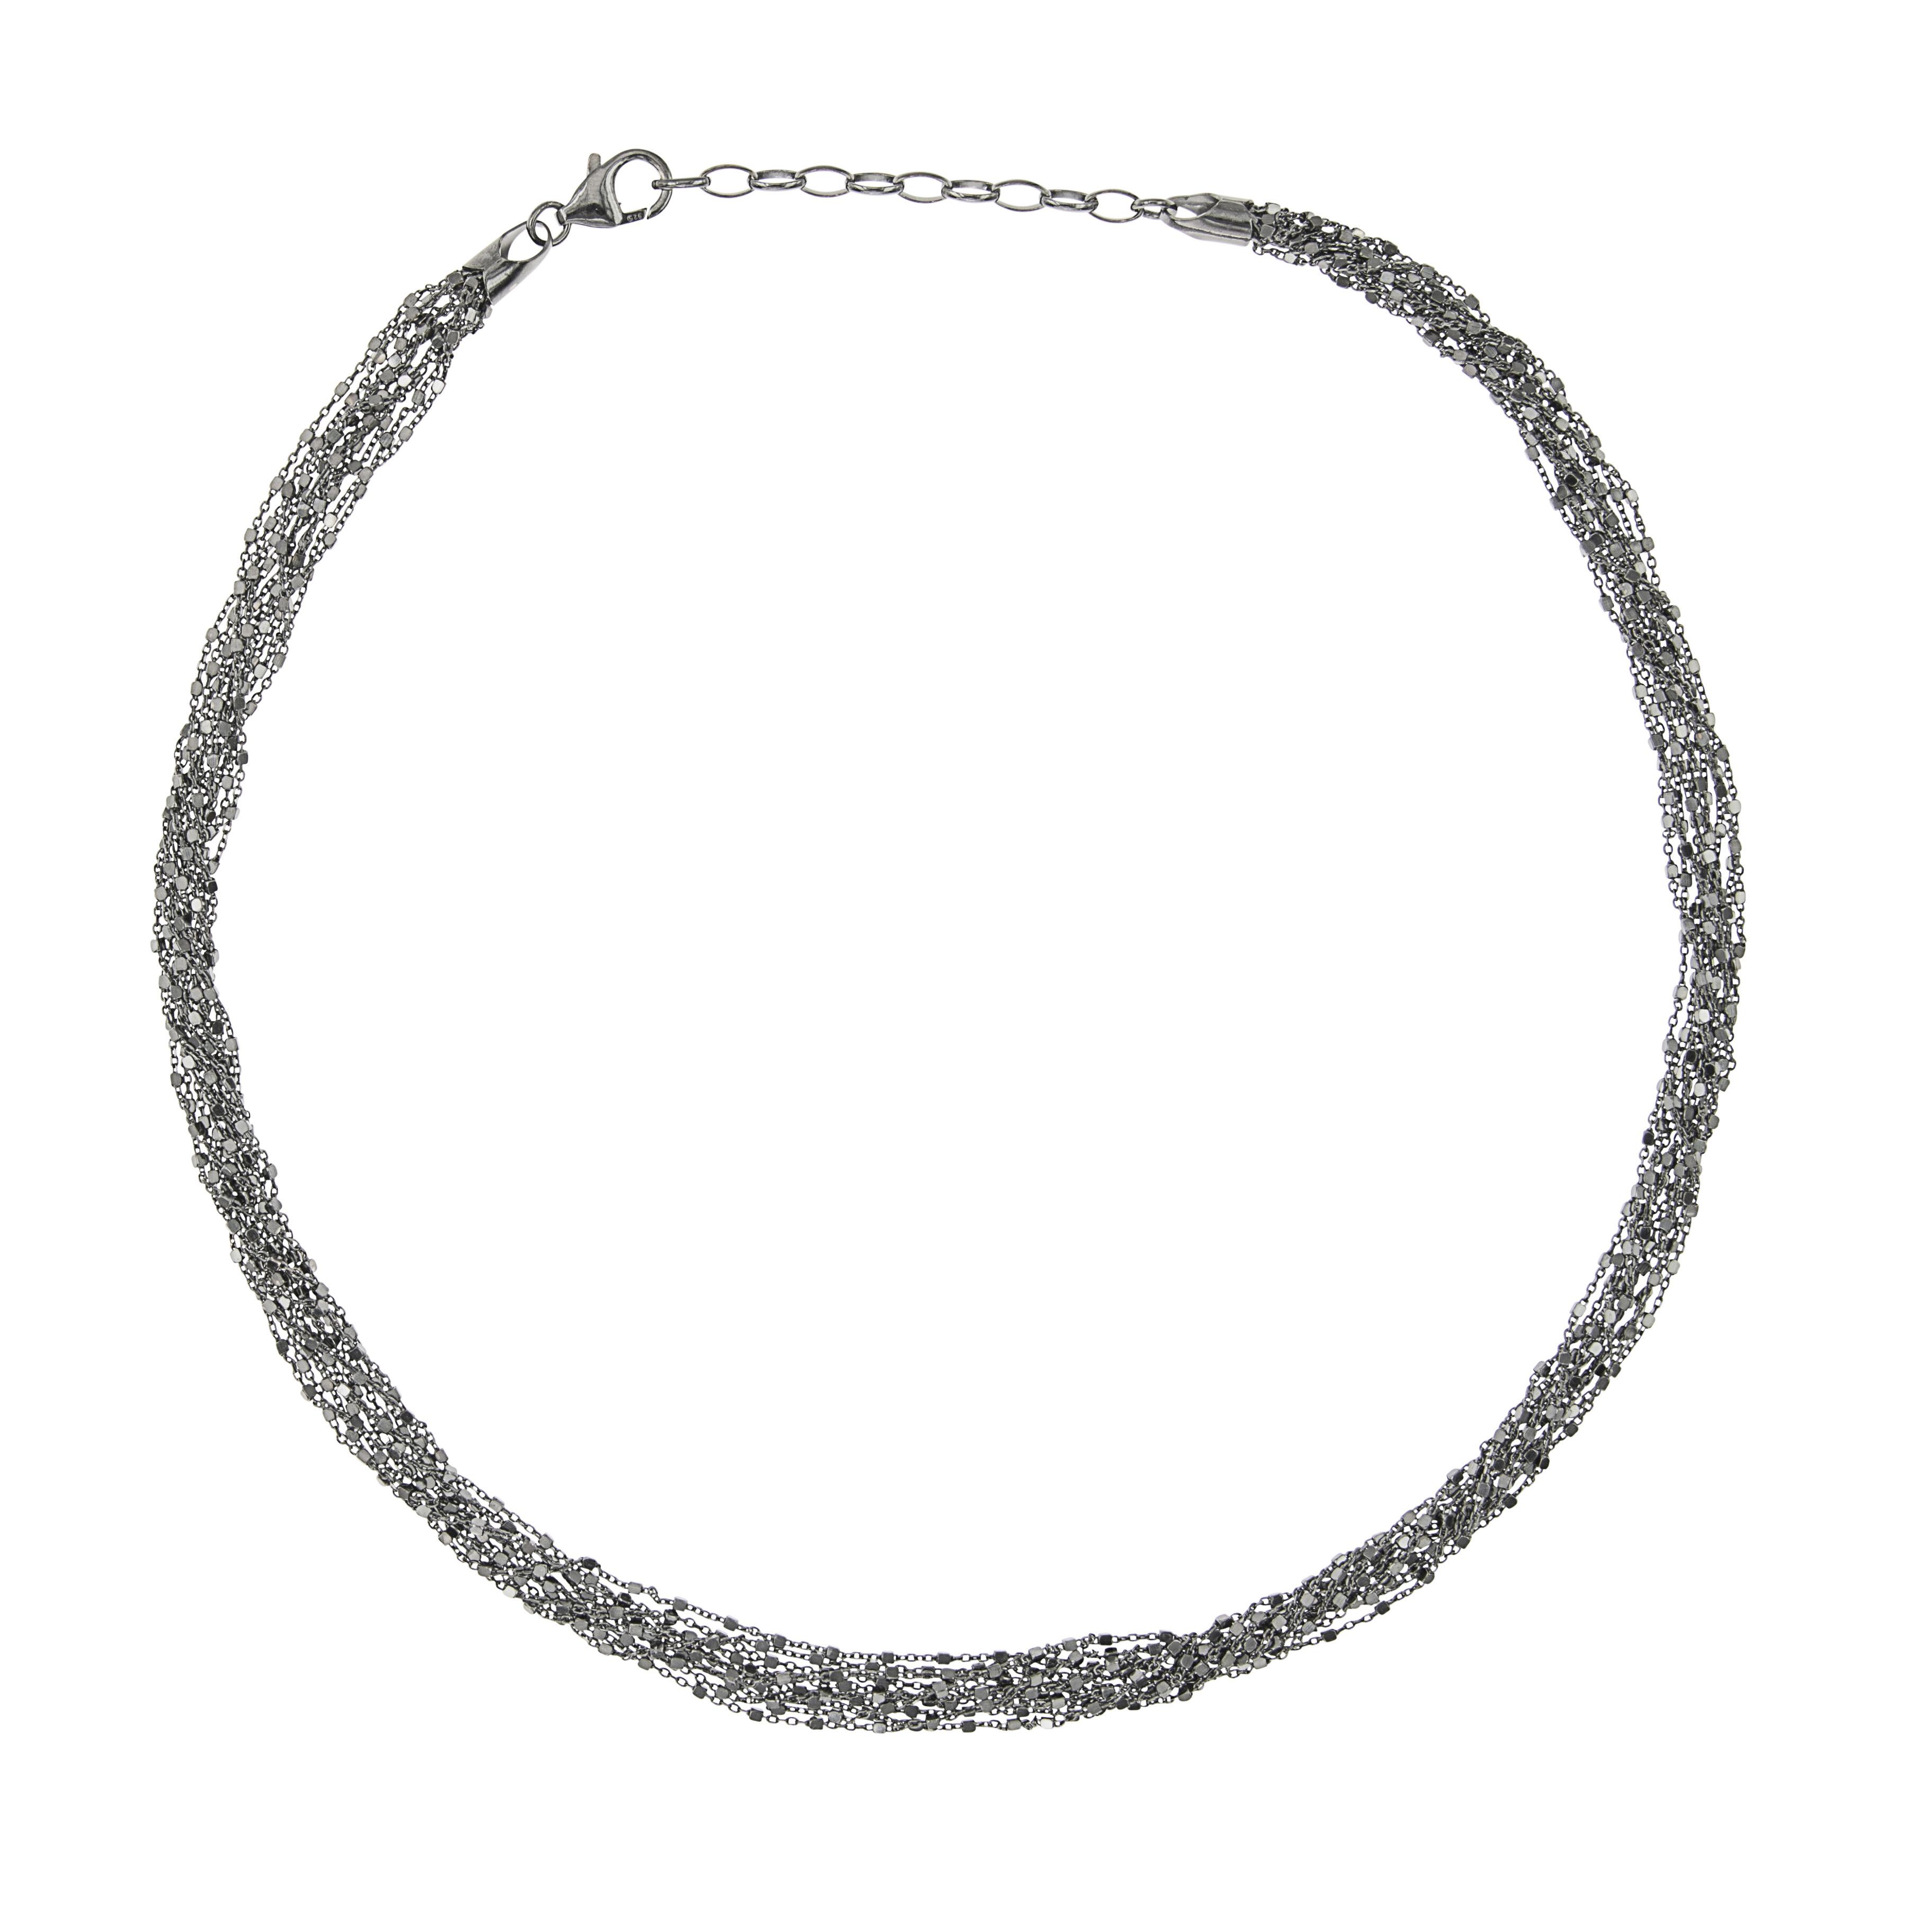 Tezer Black Rhodium Sparkle Necklace